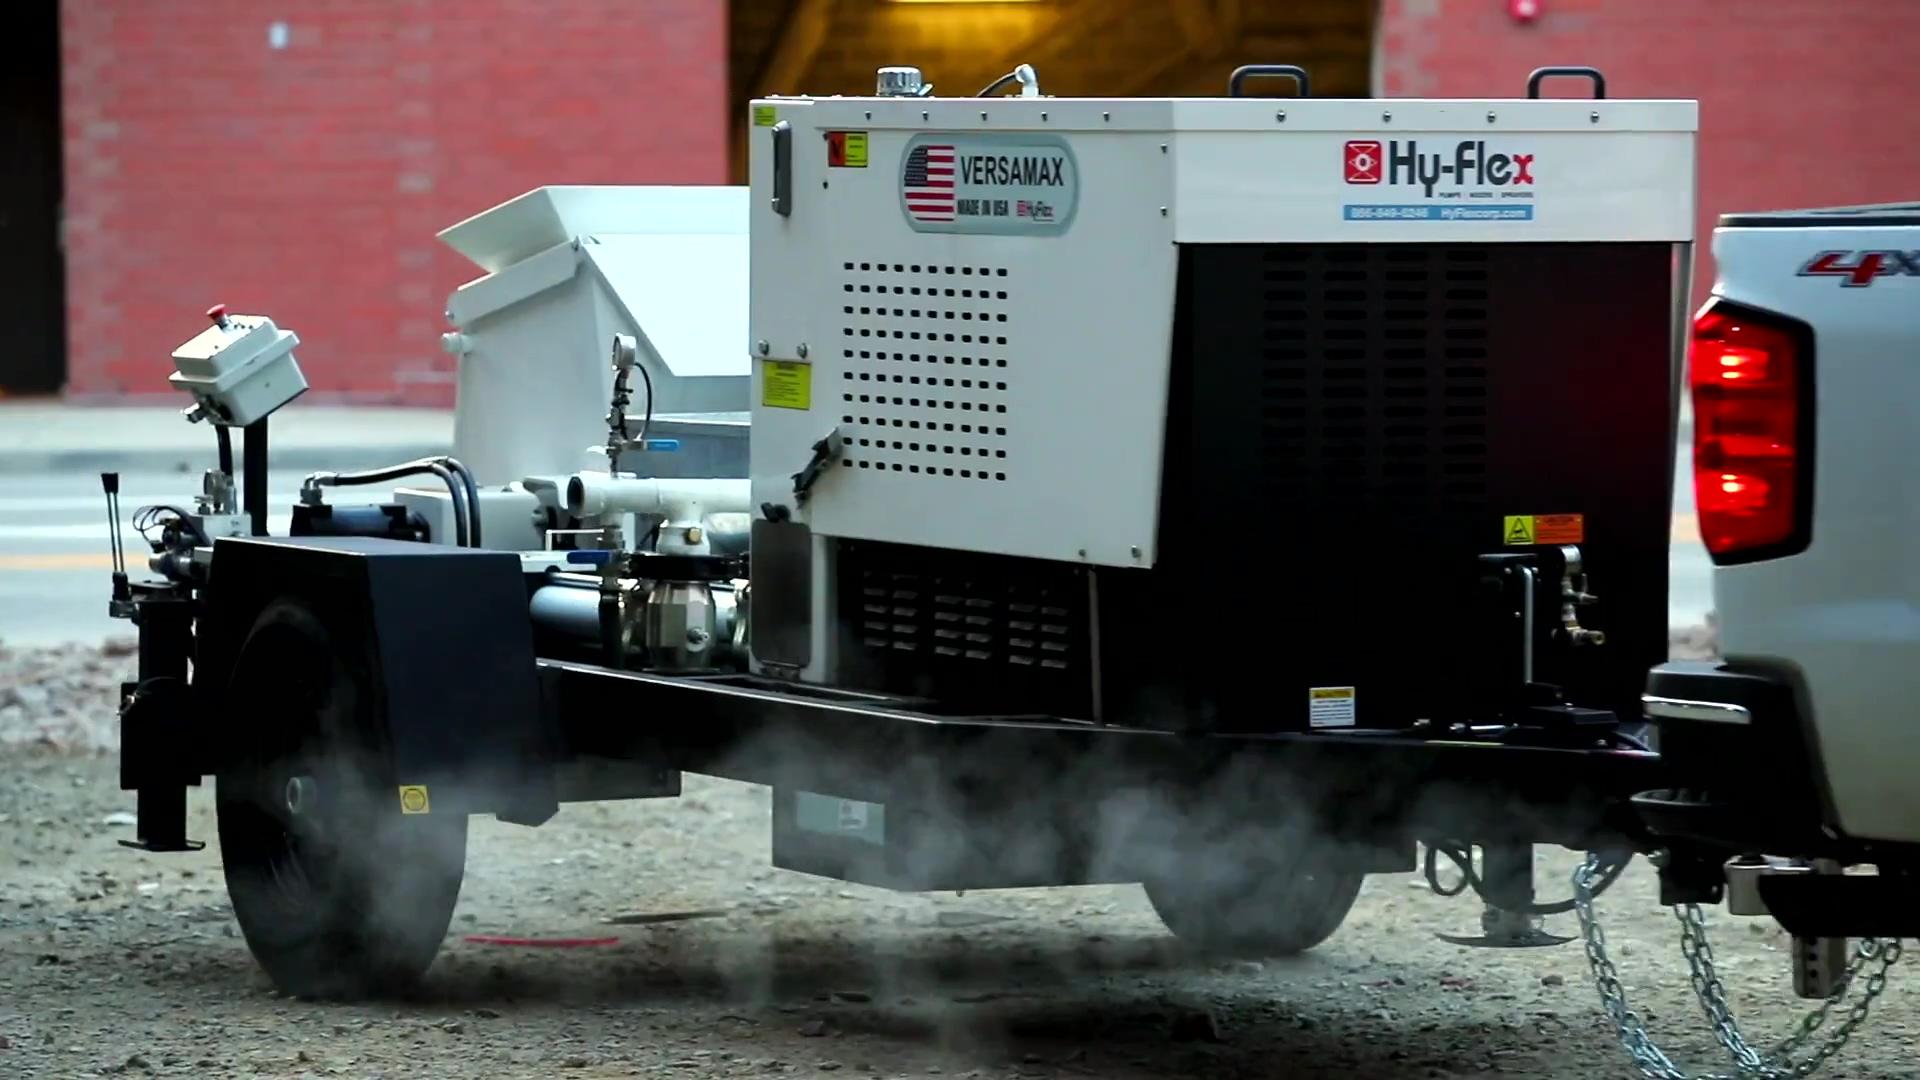 pump-mixer-fireproofing-versamax-HyFlex